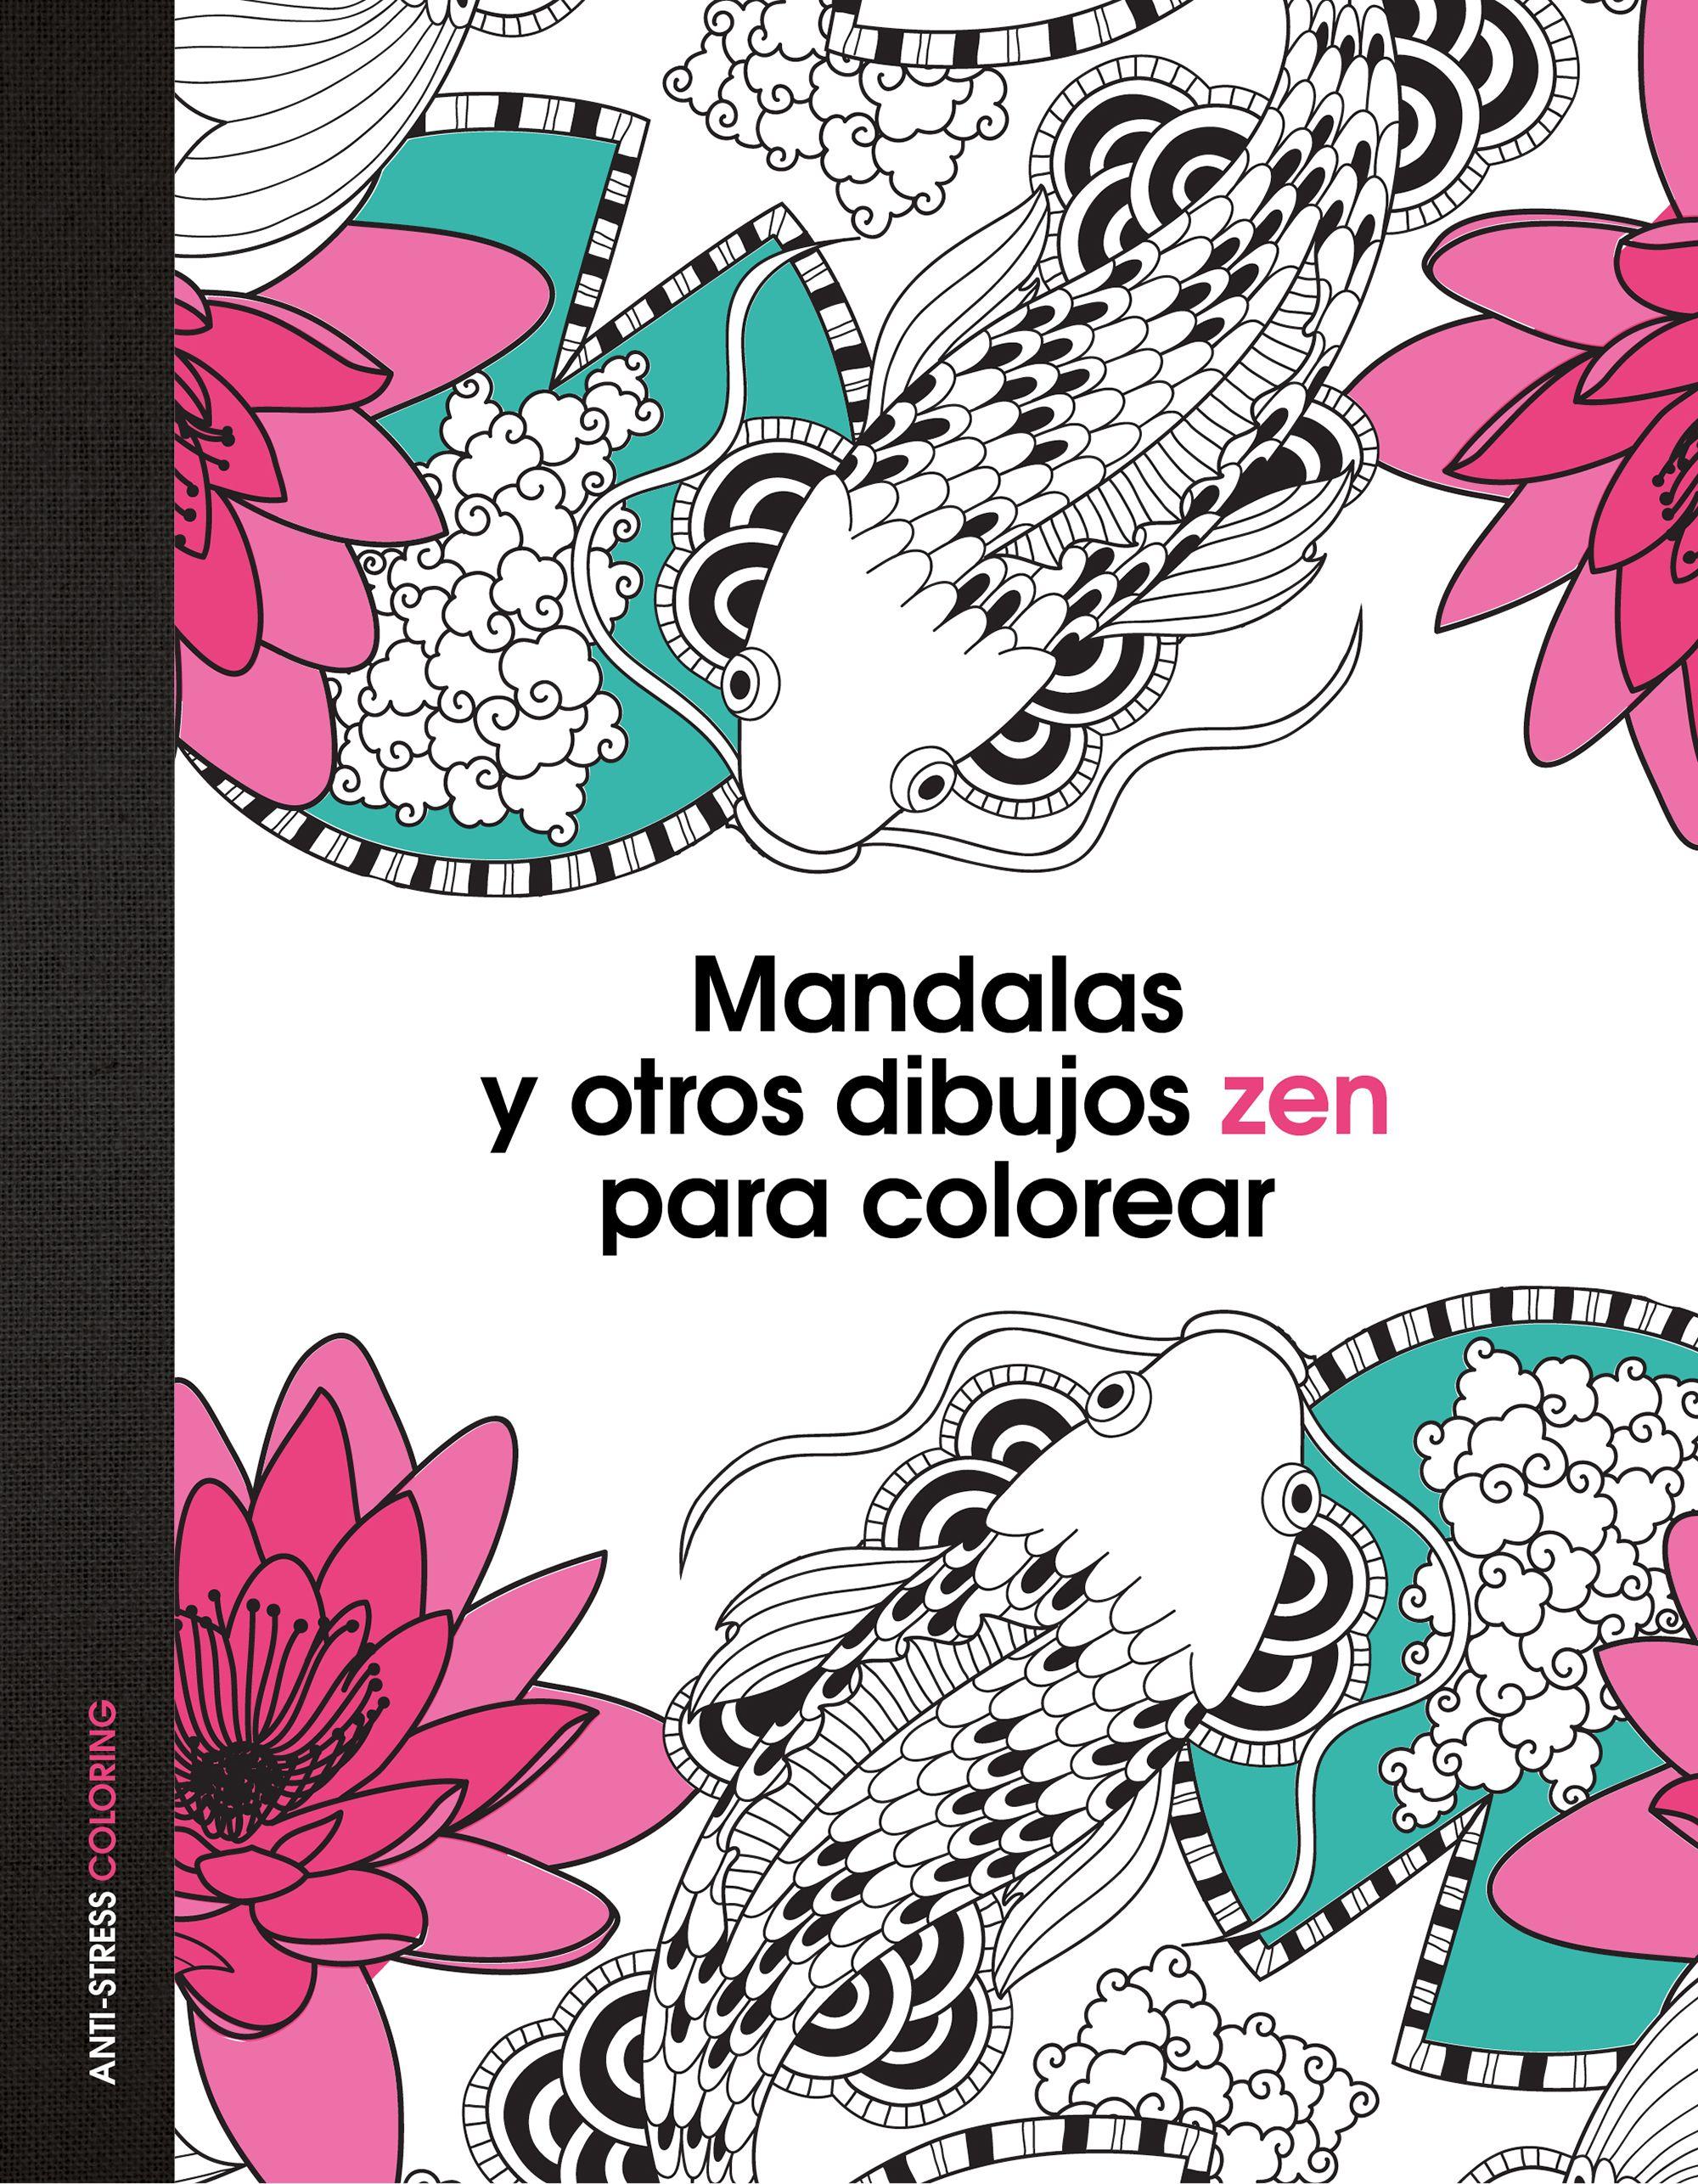 Perfecto Libro De Colorear De La Historia Negra Viñeta - Dibujos ...